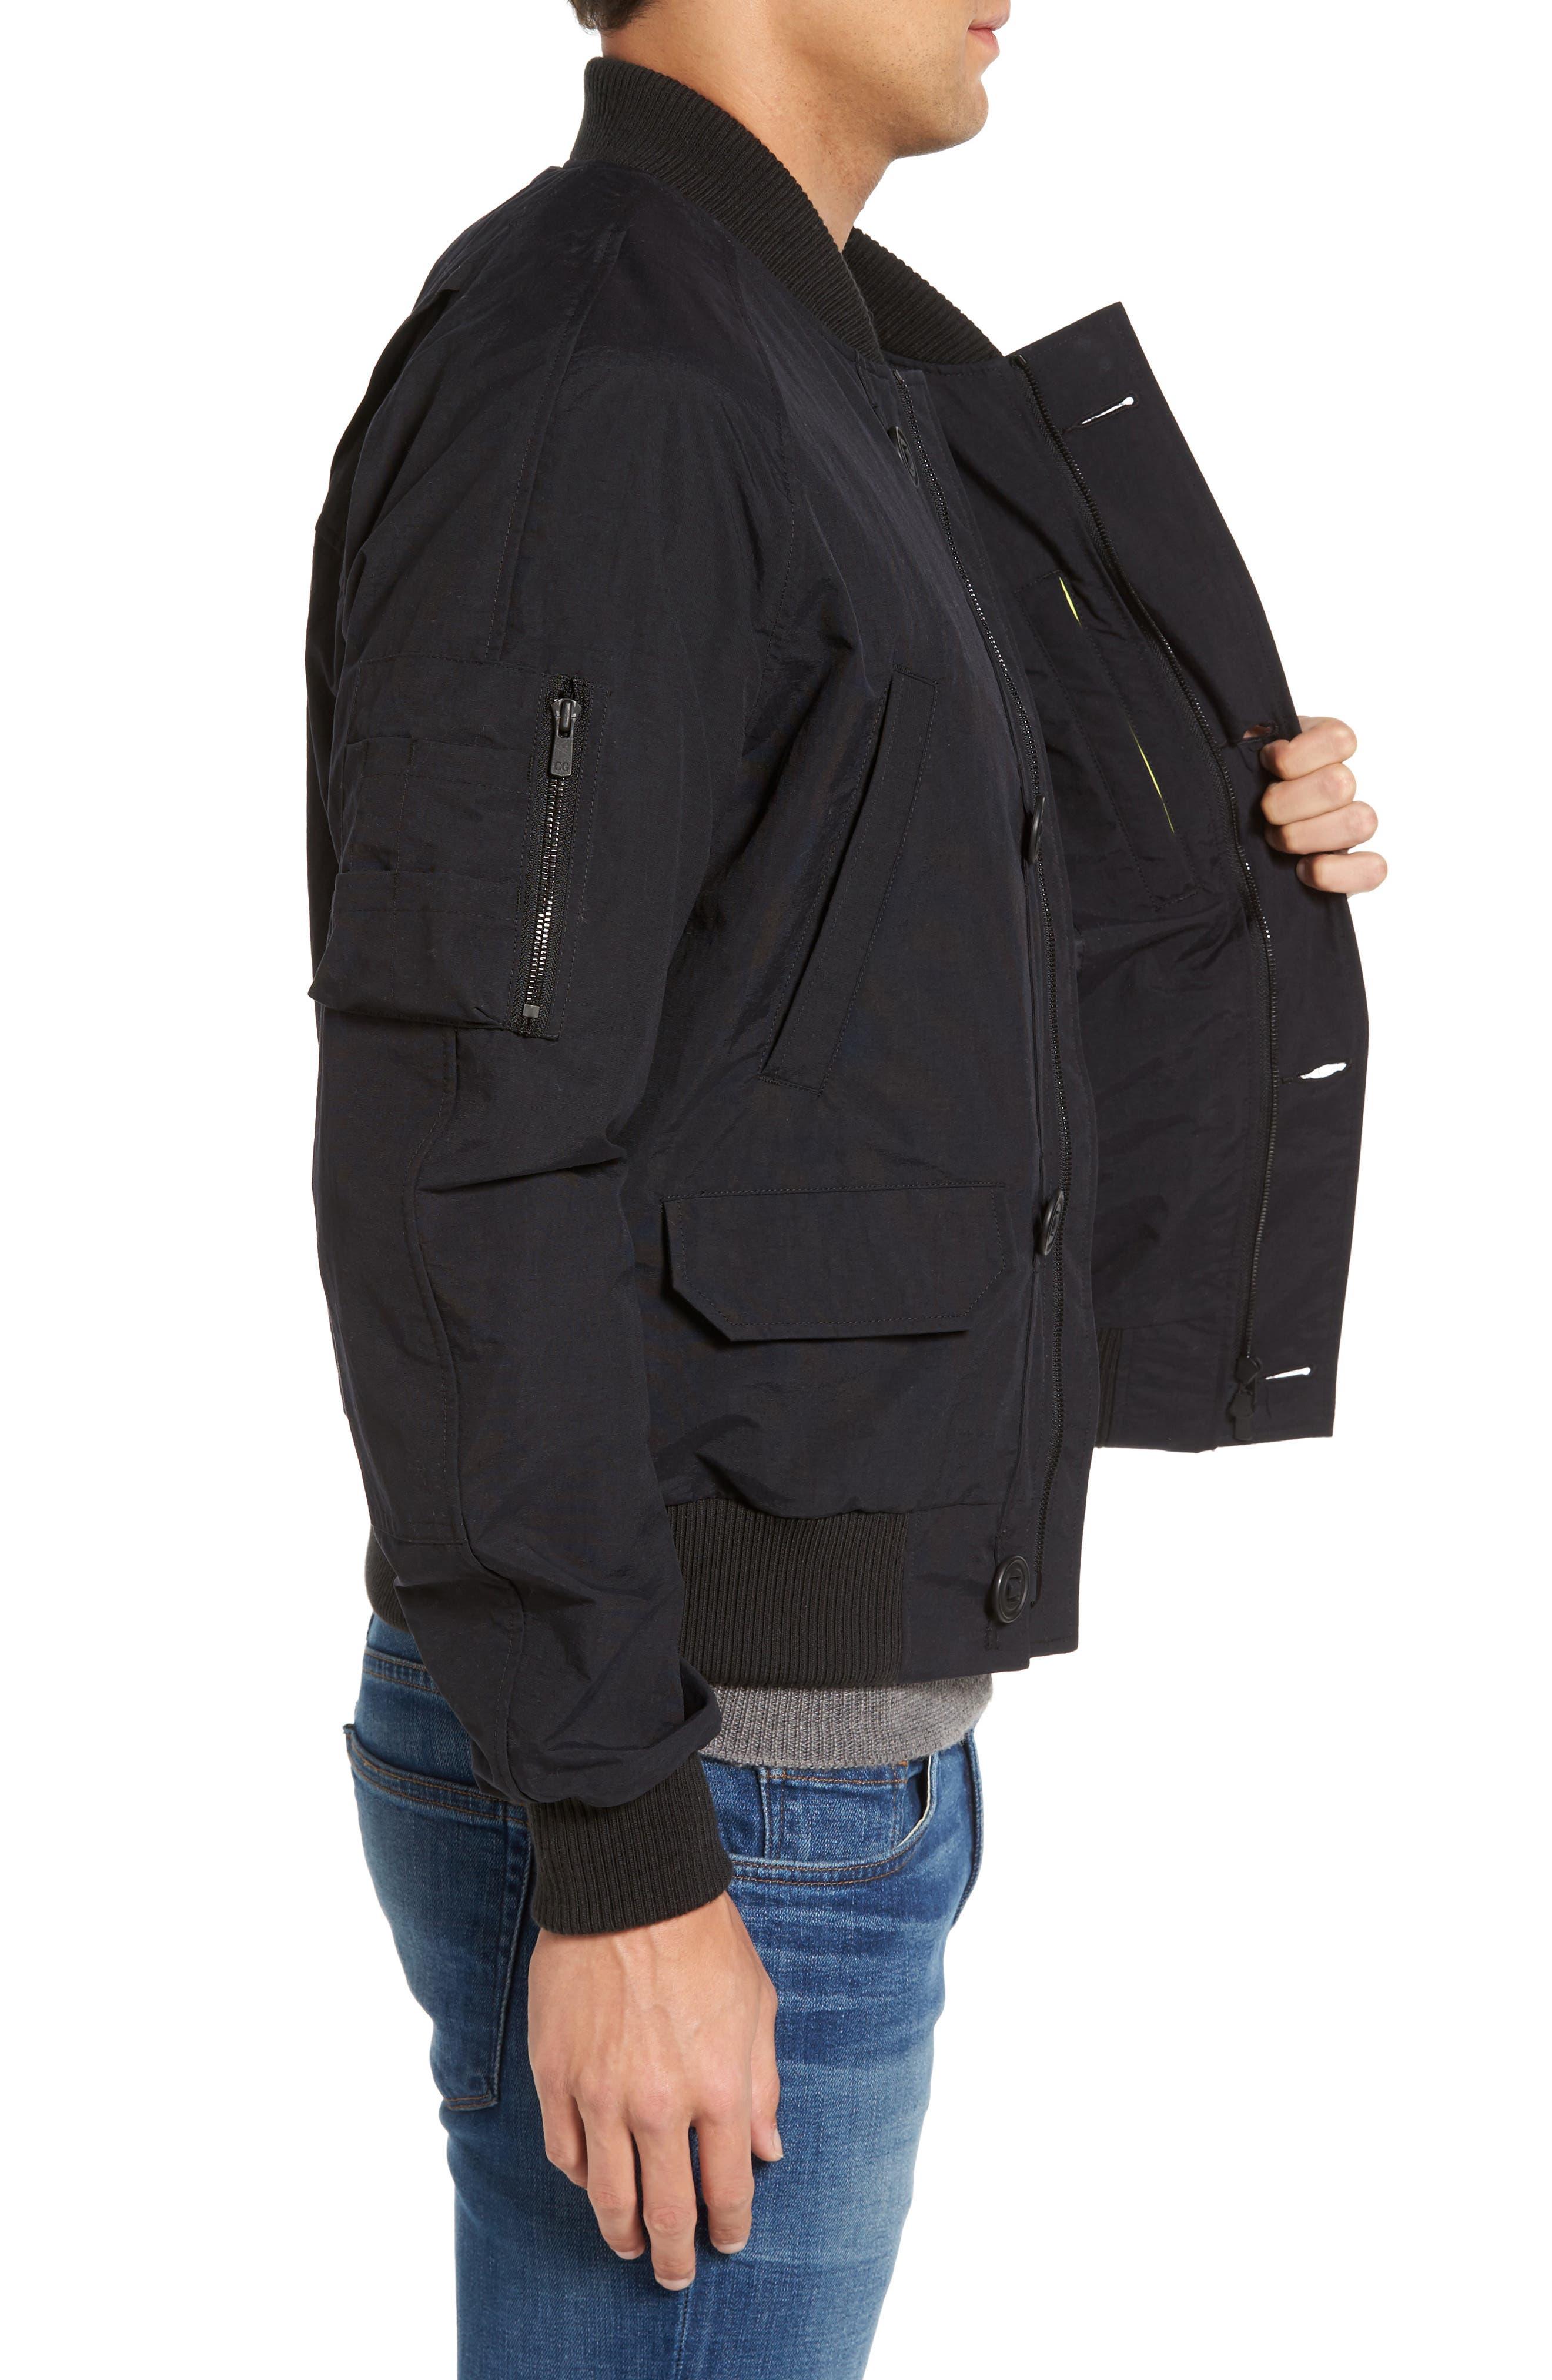 Faber Slim Fit Bomber Jacket,                             Alternate thumbnail 3, color,                             BLACK